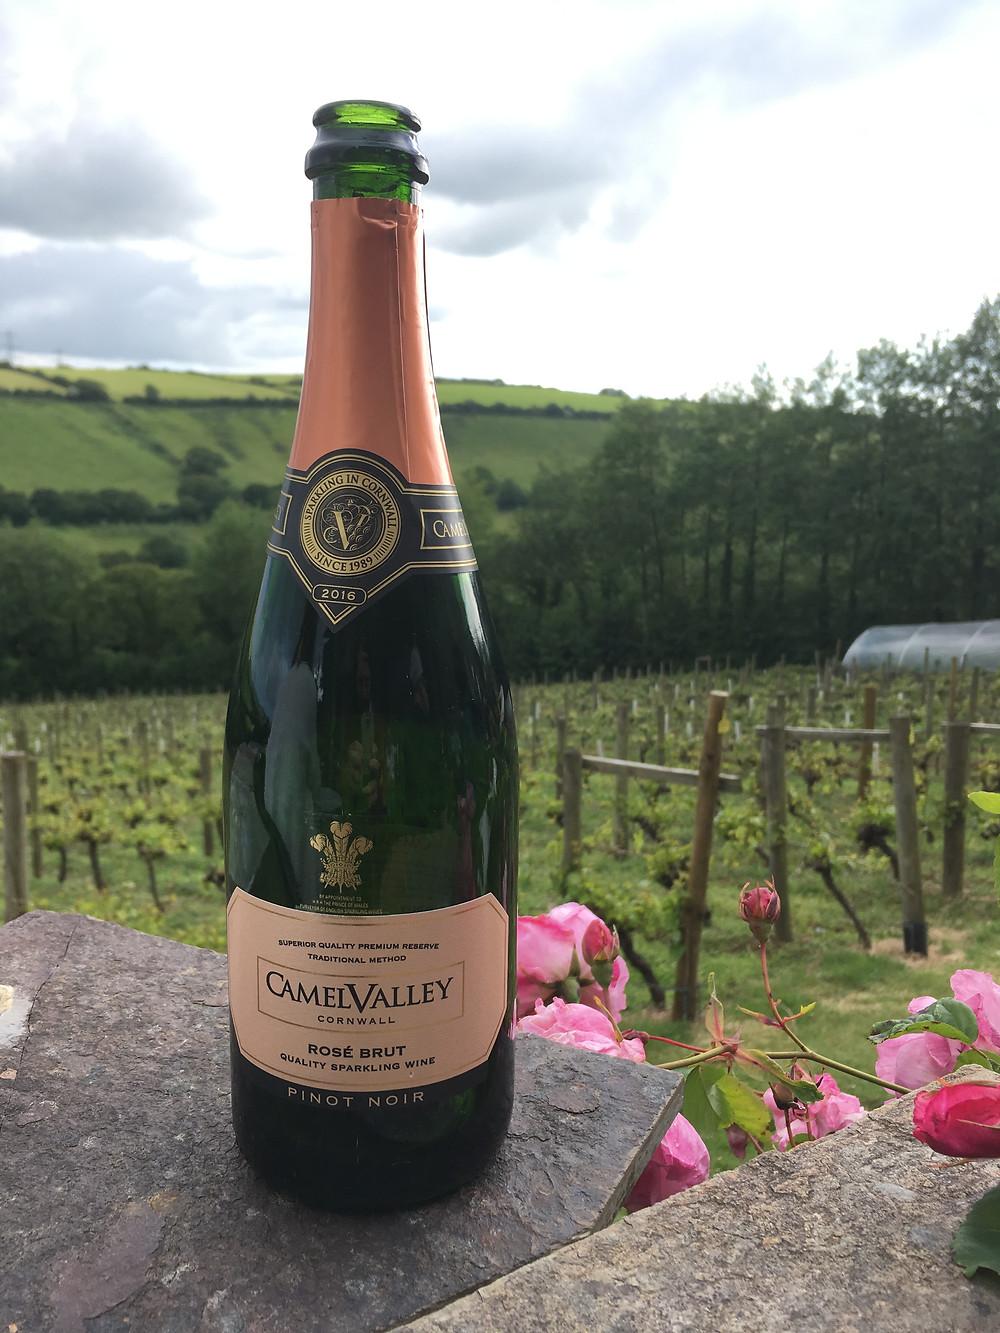 Camel Valley wine on Sun Terrace, Cornwall, Tregolls Farm